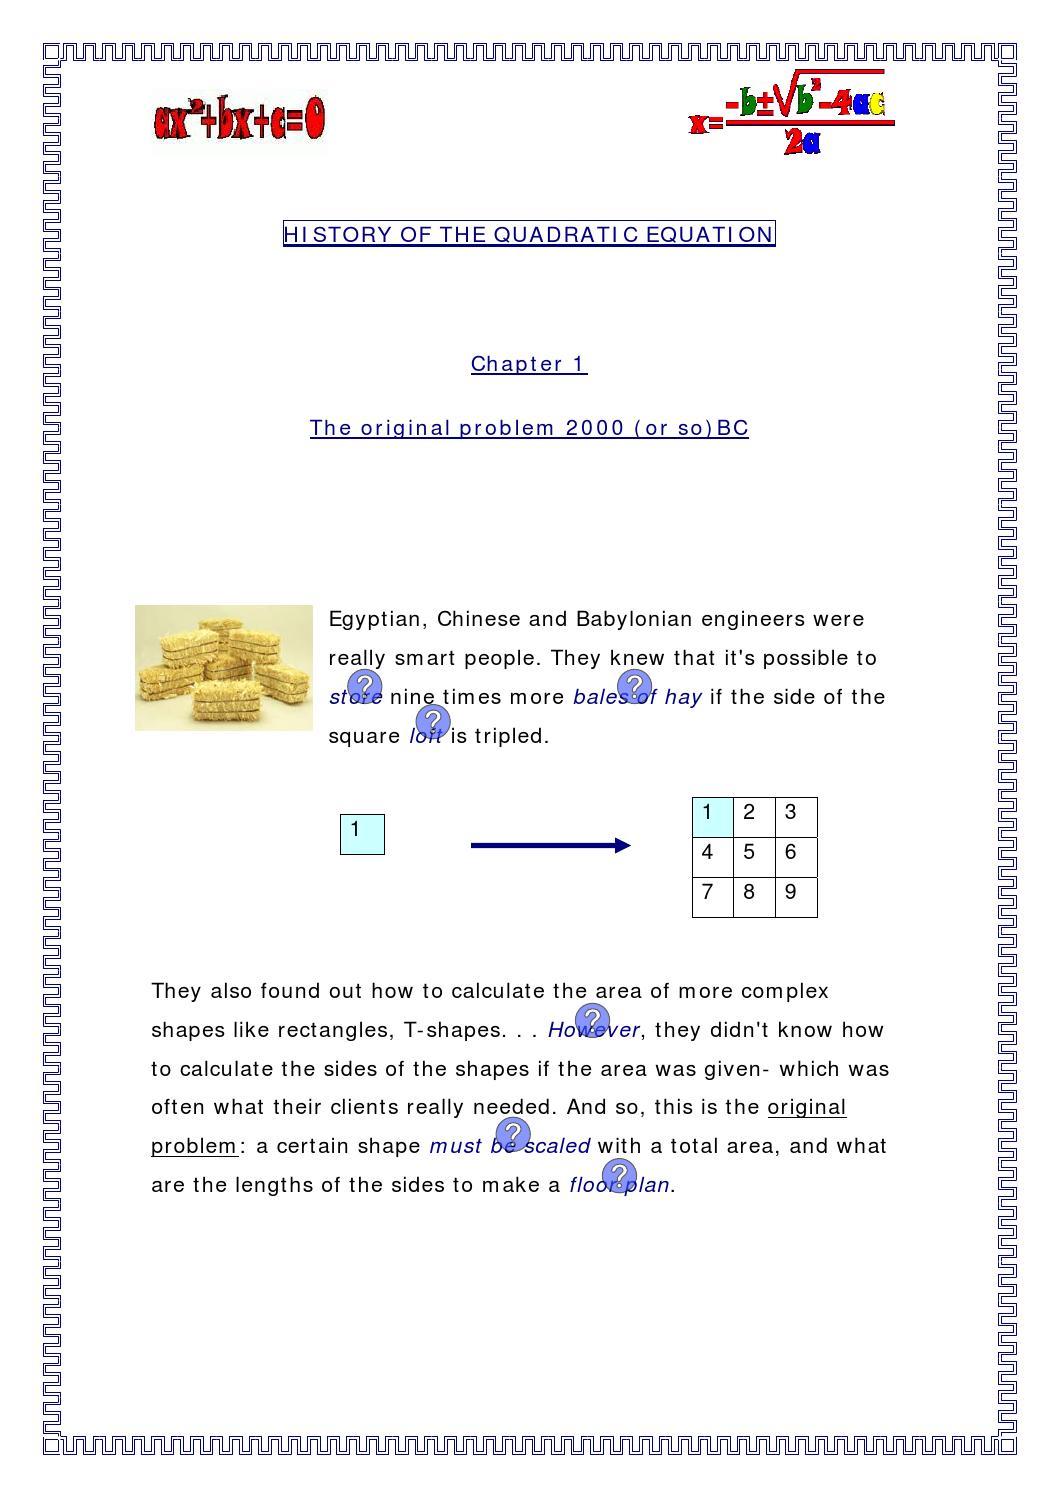 history of quadratic equation Quadratic equations gcse maths revision this section looks at quadratic  equations how to solve quadratic equations by factorising, solve quadratic  equations.